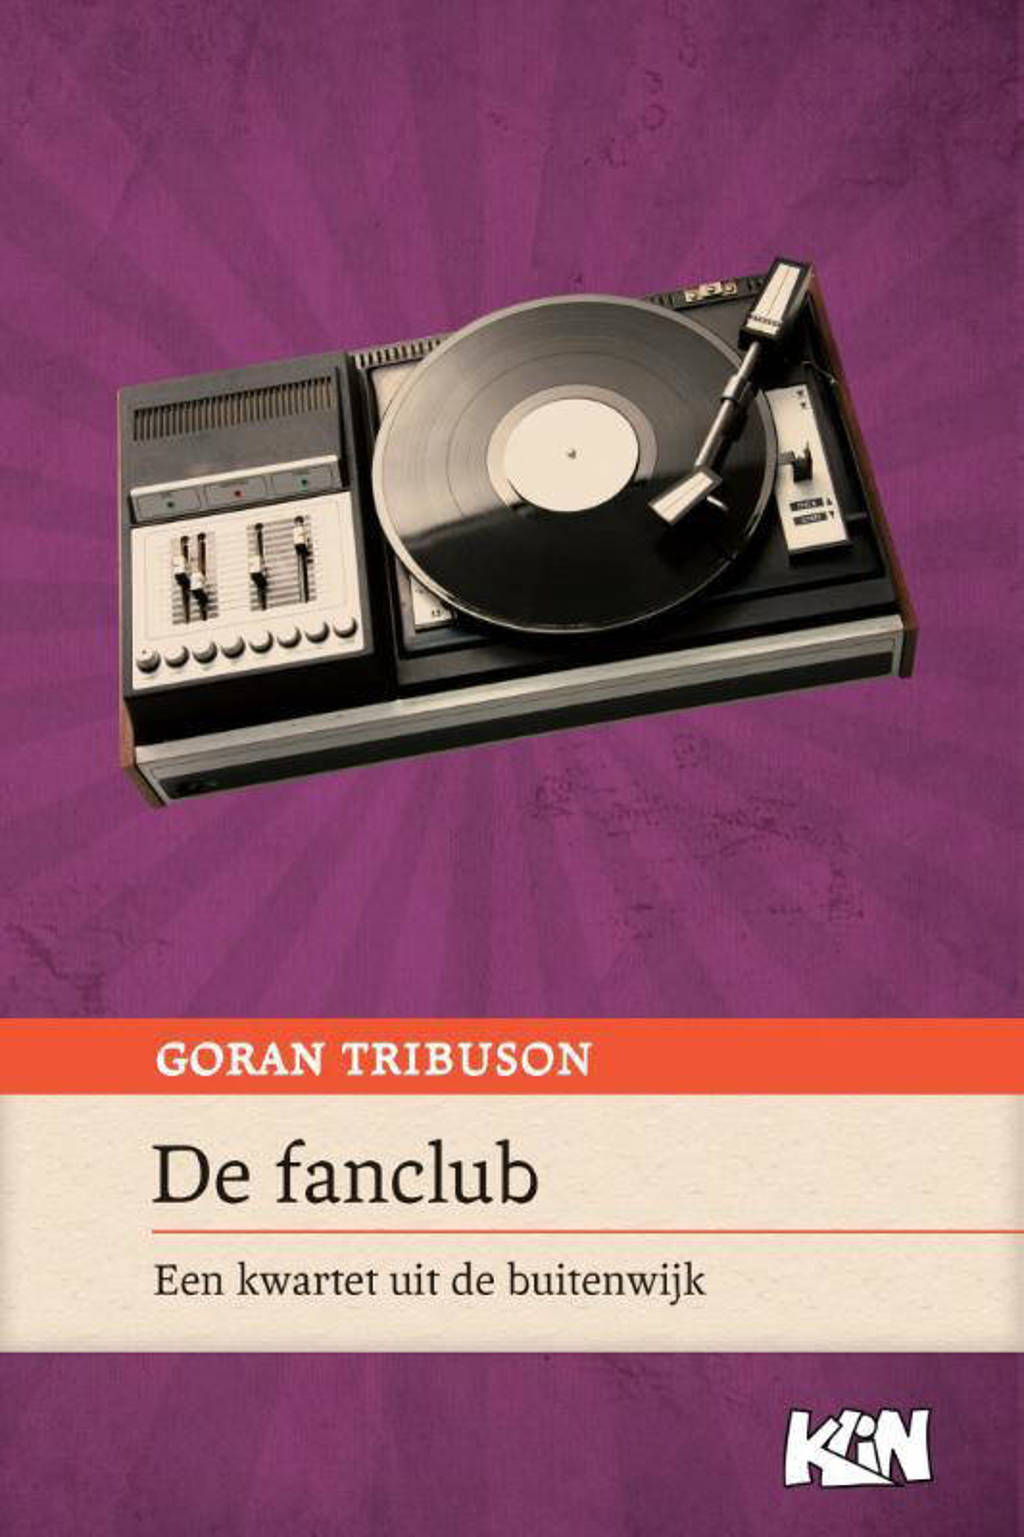 Kroatische literatuur in Nederland: De fanclub - Goran Tribuson